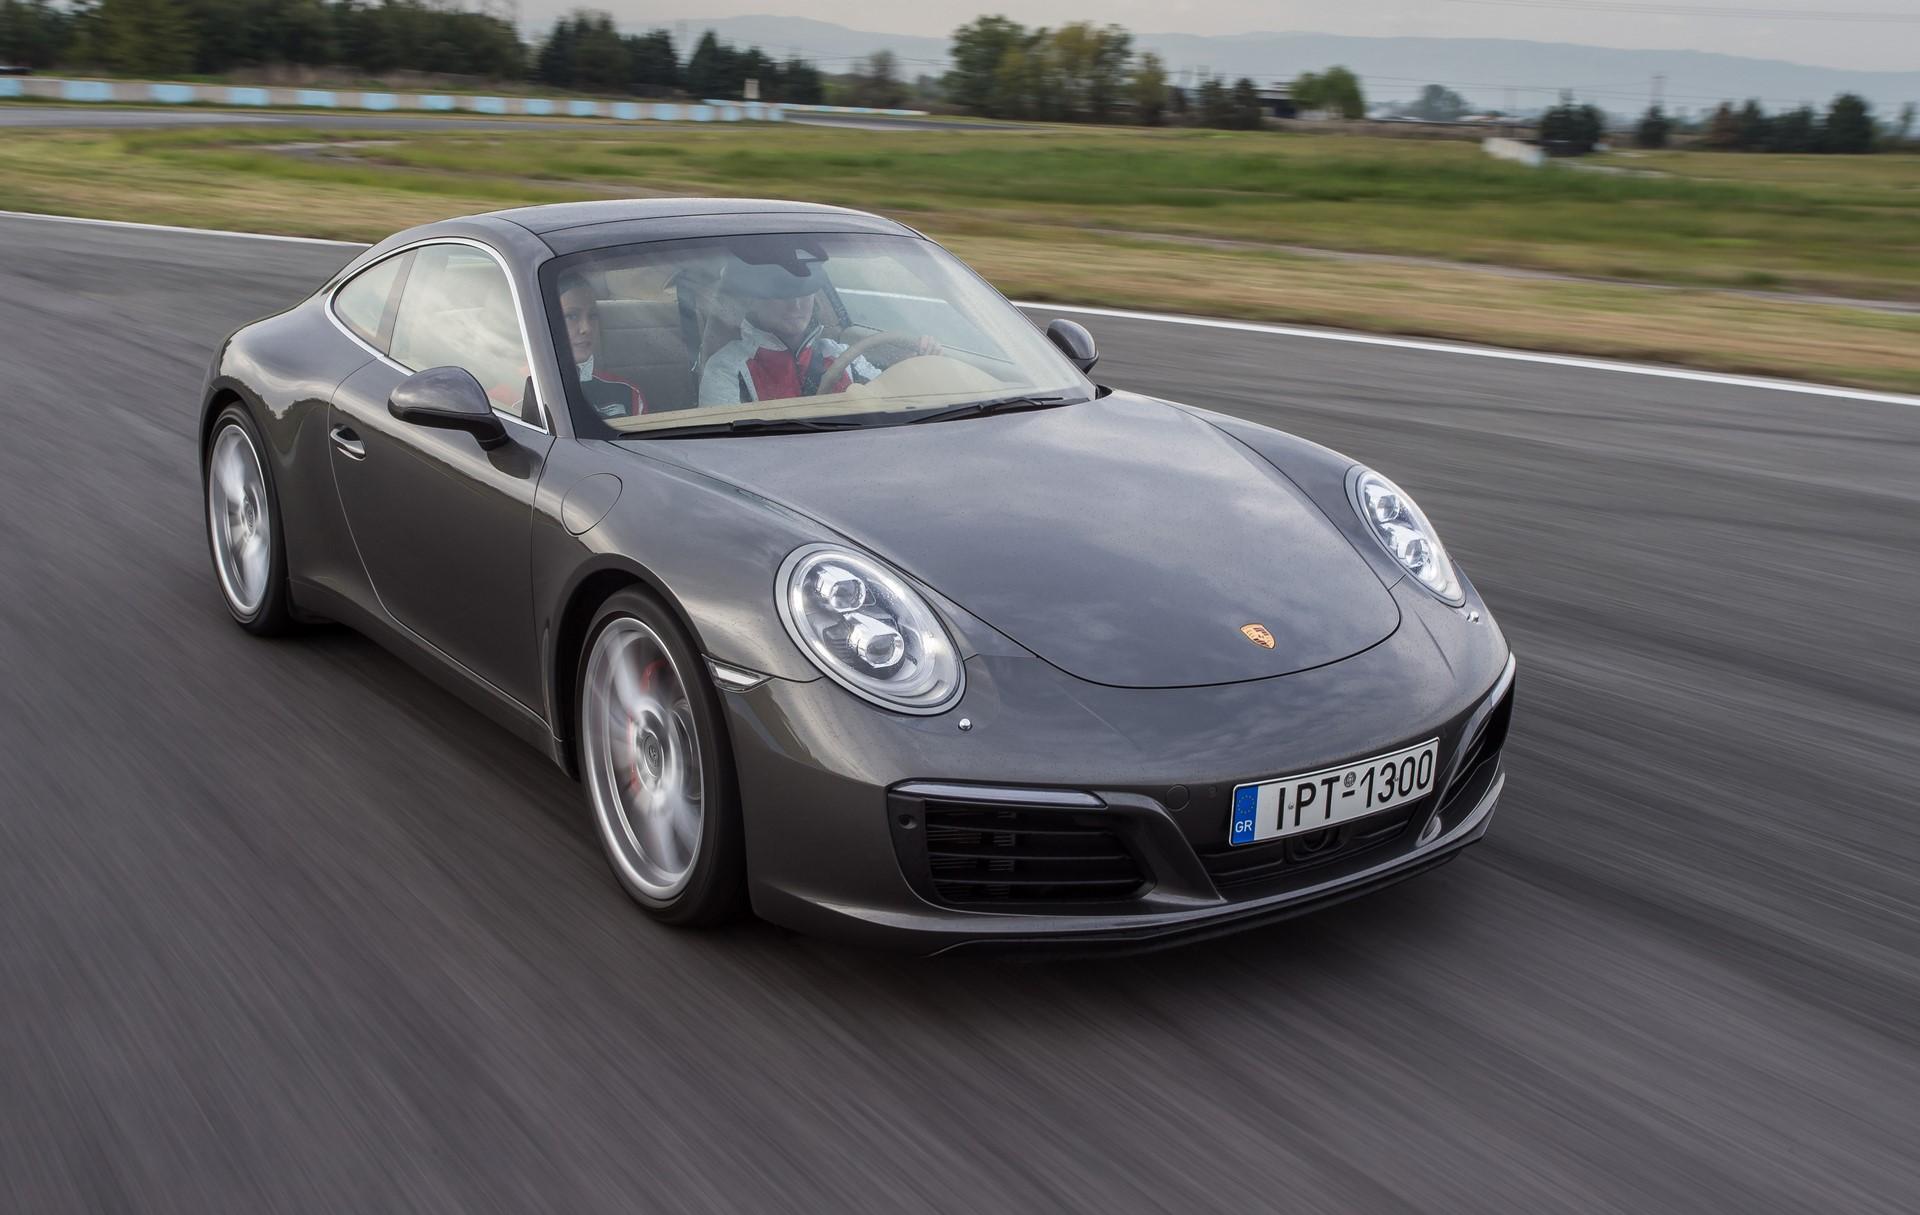 Porsche Driving Experience 2017 Serres (51)